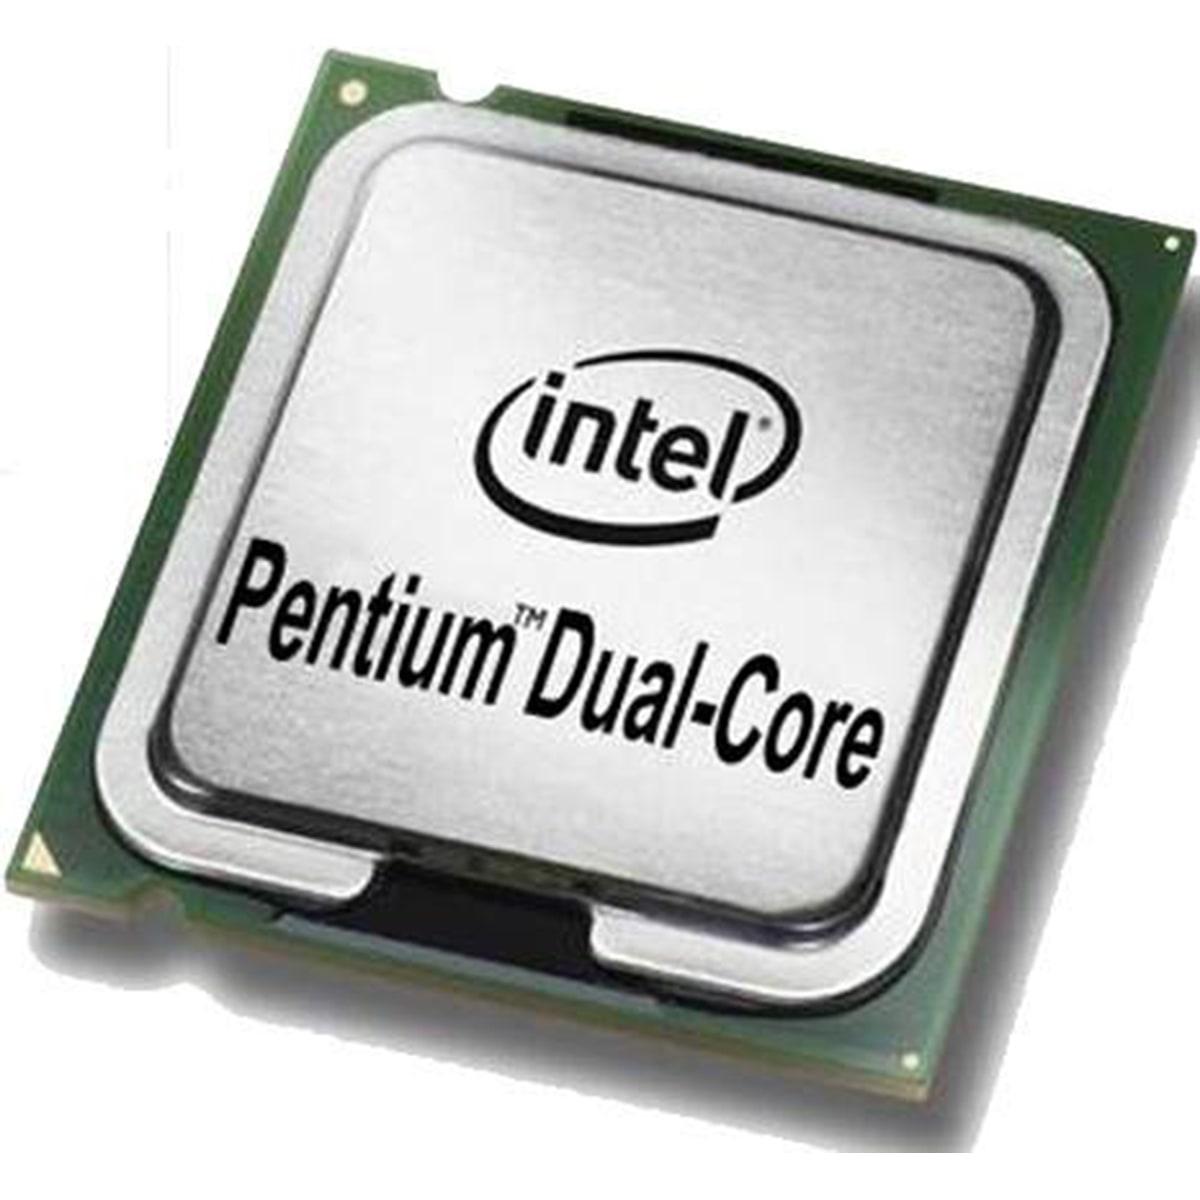 Processador Intel Dual Core E5400 2,70Ghz 2M Cache 800 MHz Socket 775 - Seminovo